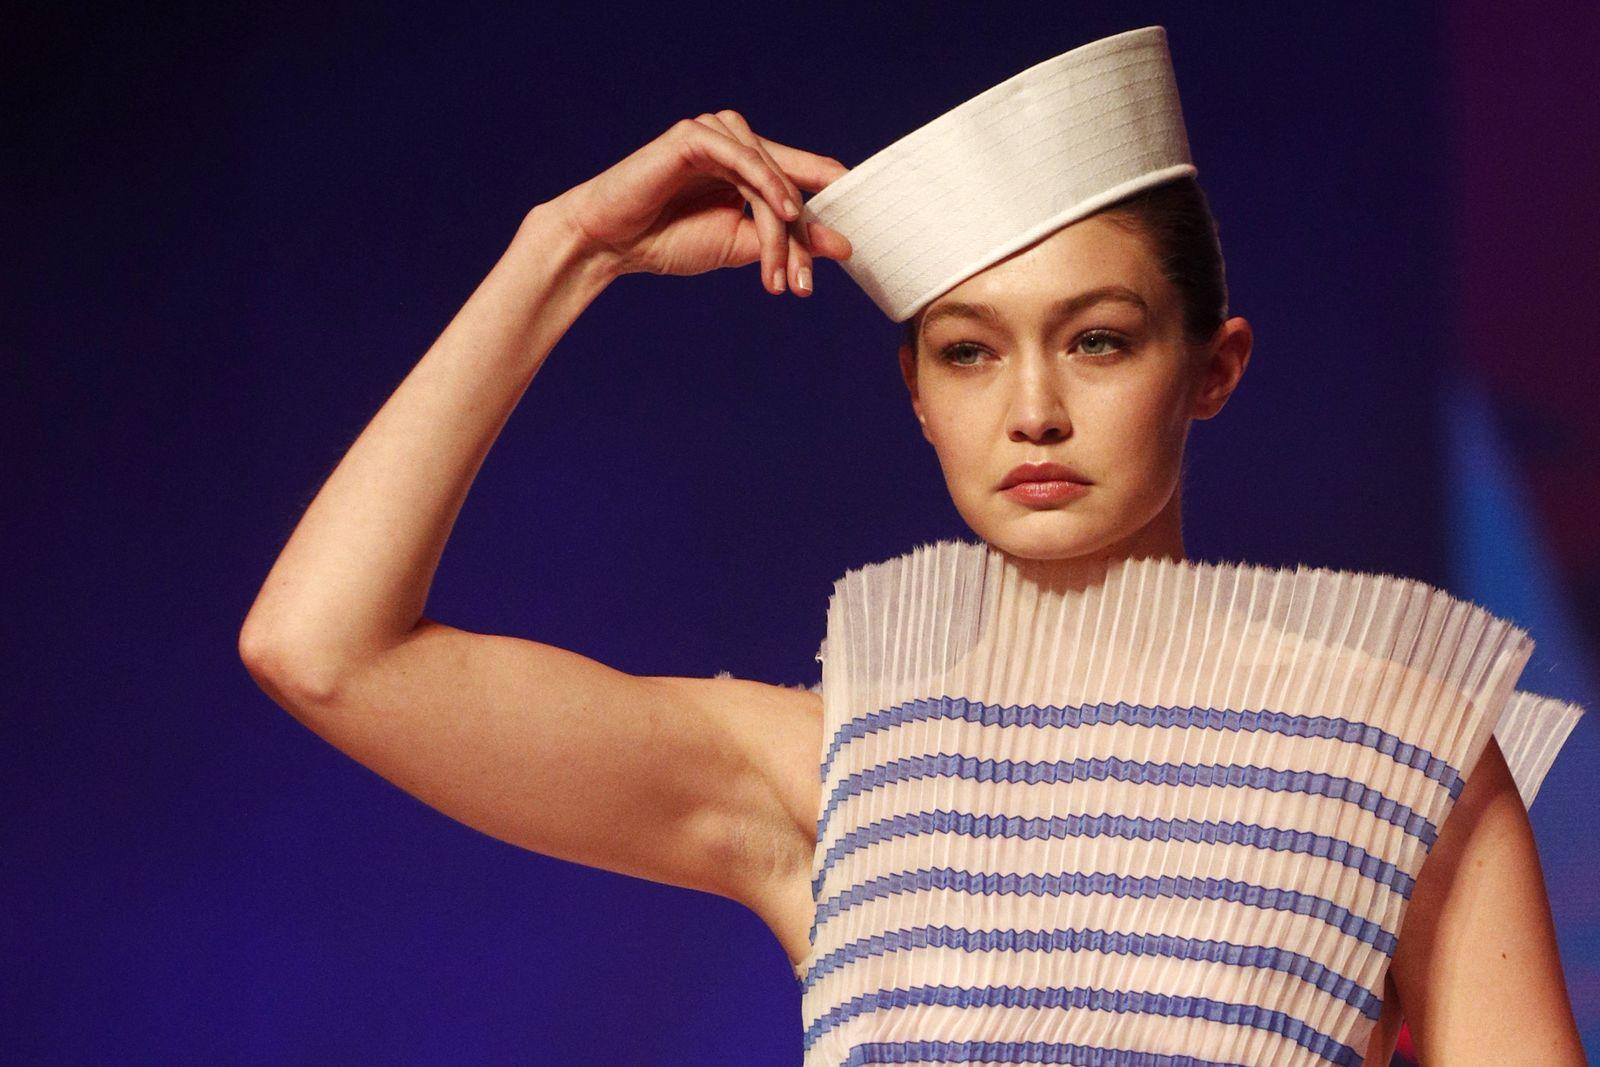 Jean Paul Gaultier - Runway - Paris Haute Couture Fashion Week S/S 2020, France - 22 Jan 2020